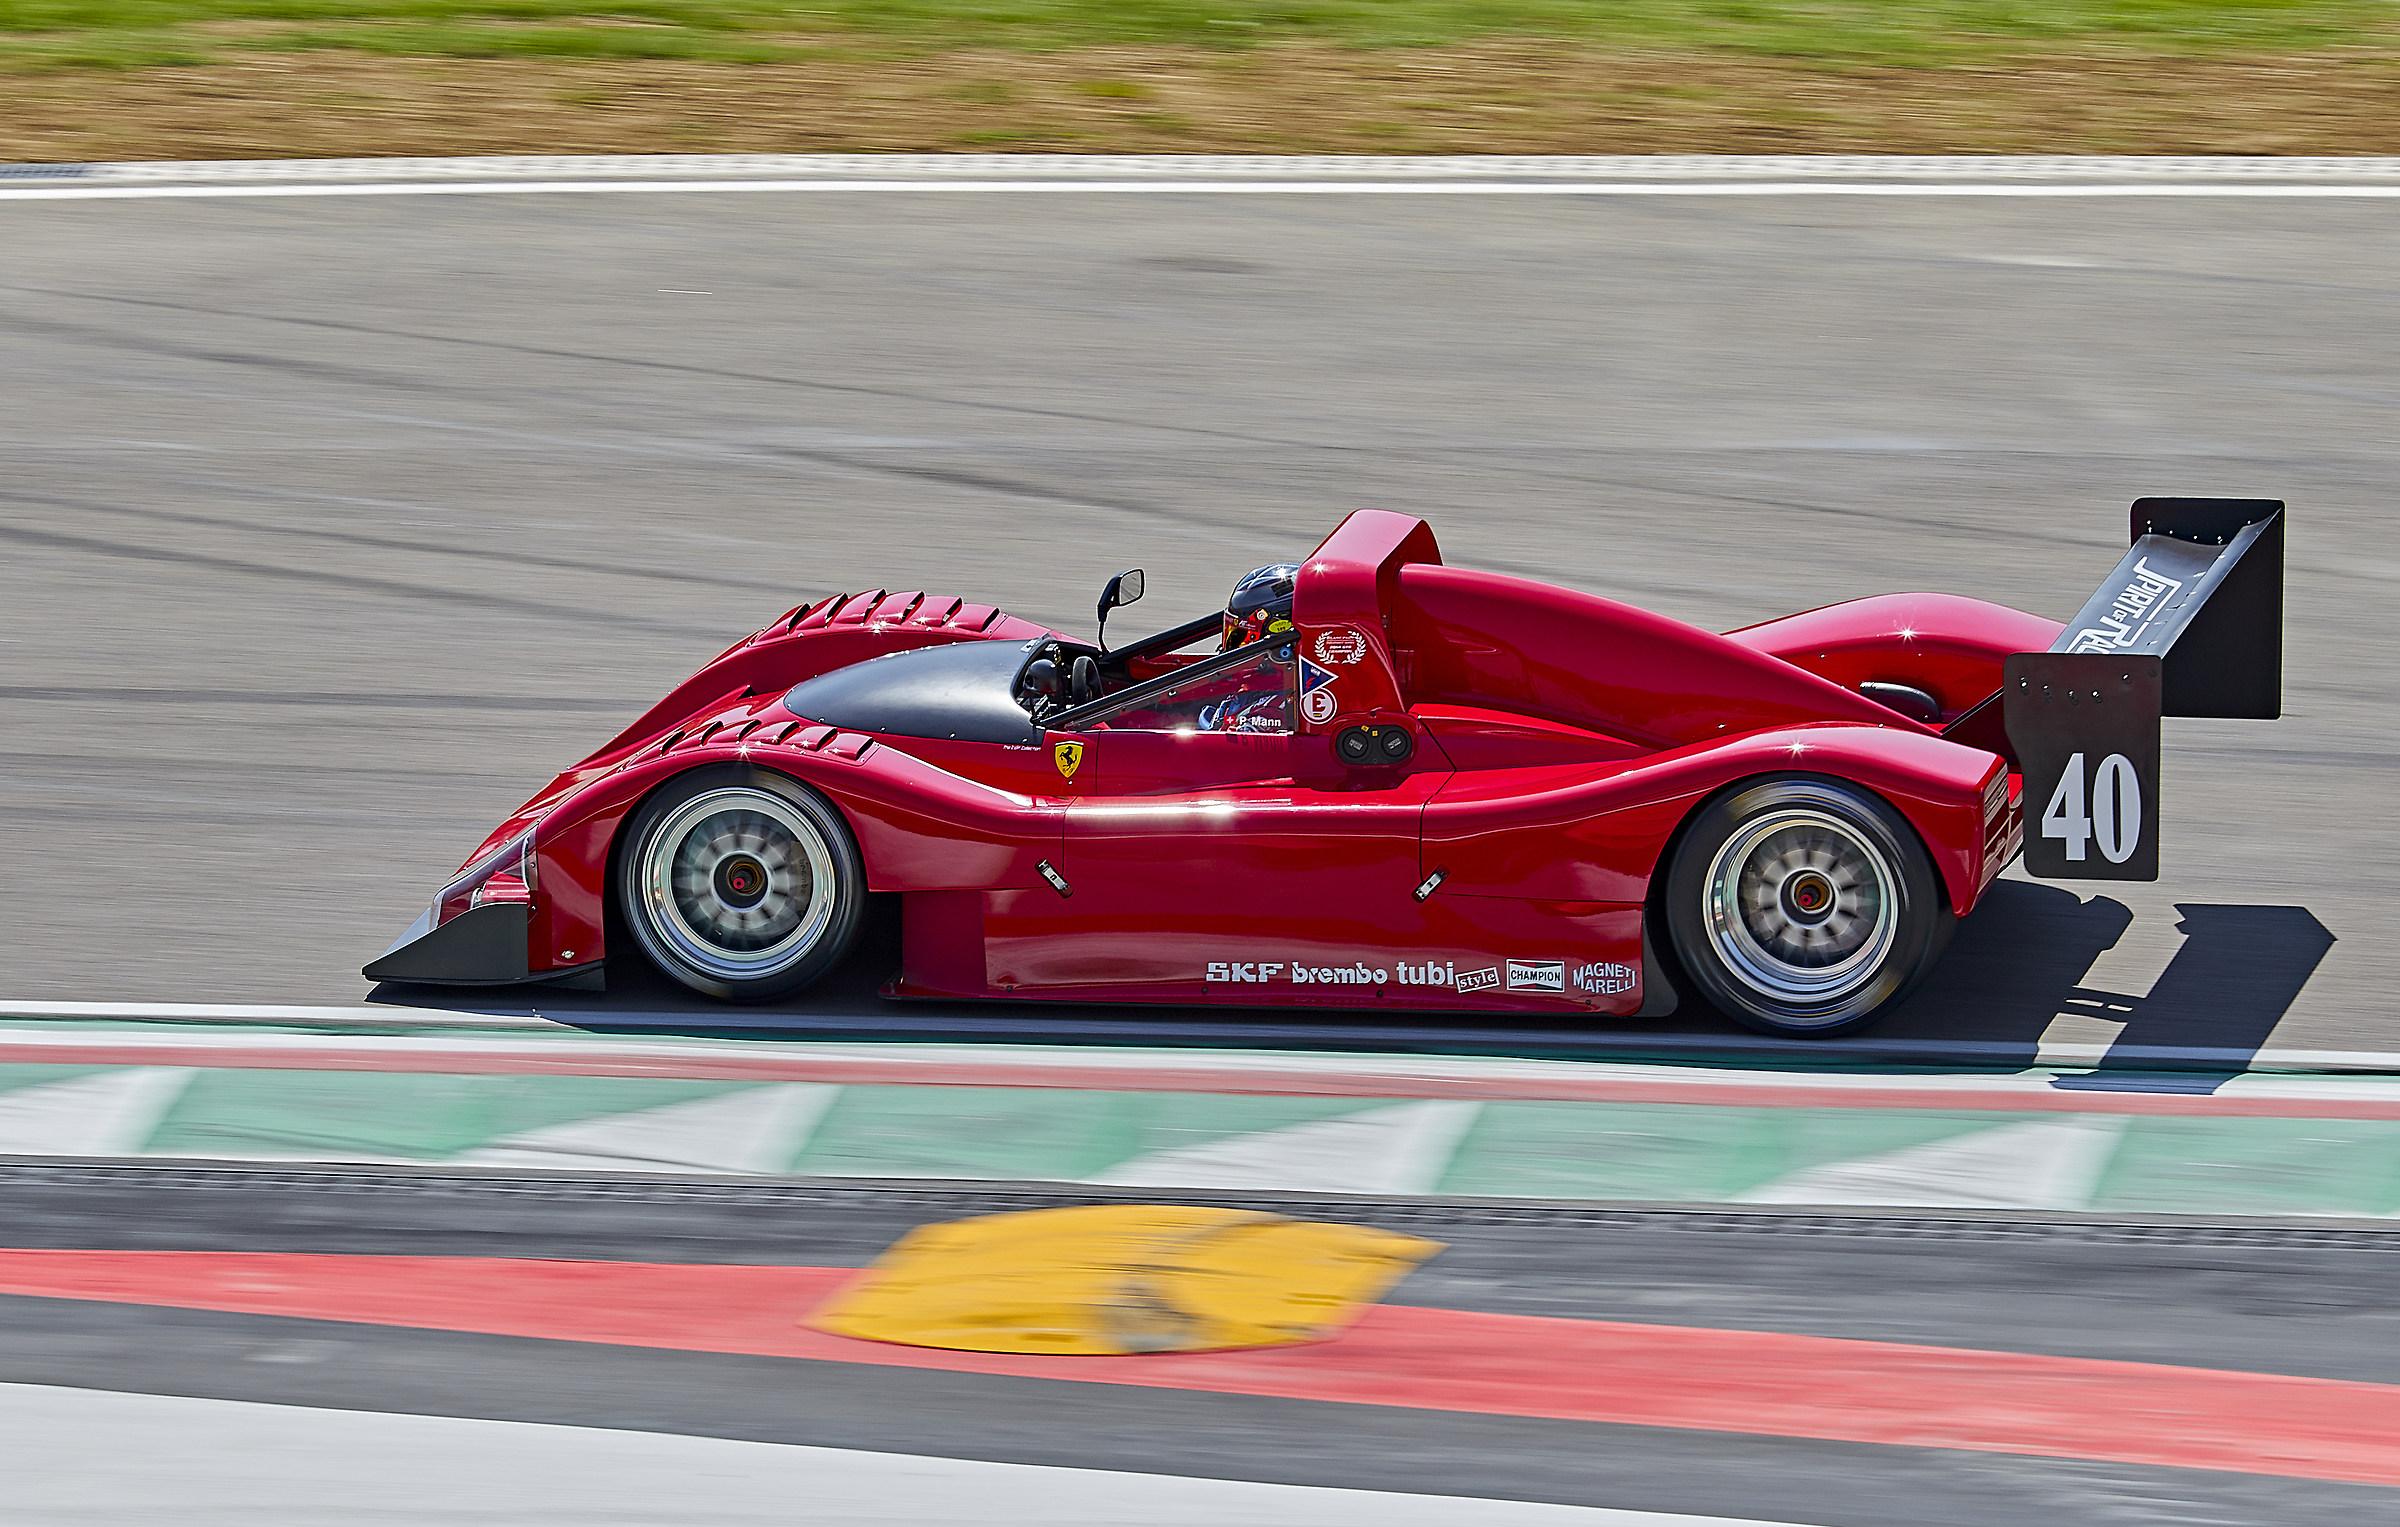 Motor legend Imola...